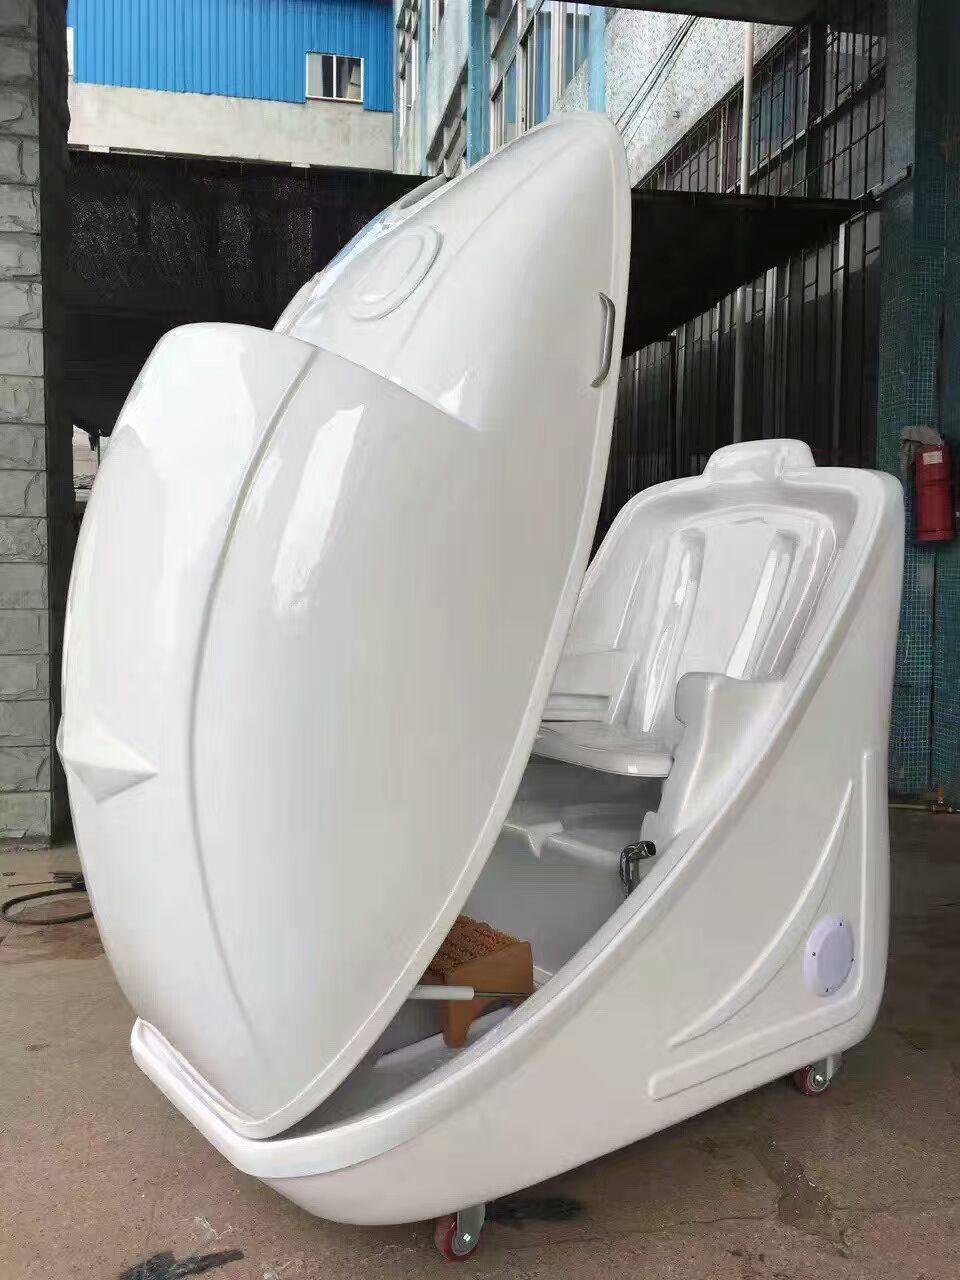 Spa Capsule Ozone Steam Sauna For Sale Buy Ozone Steam